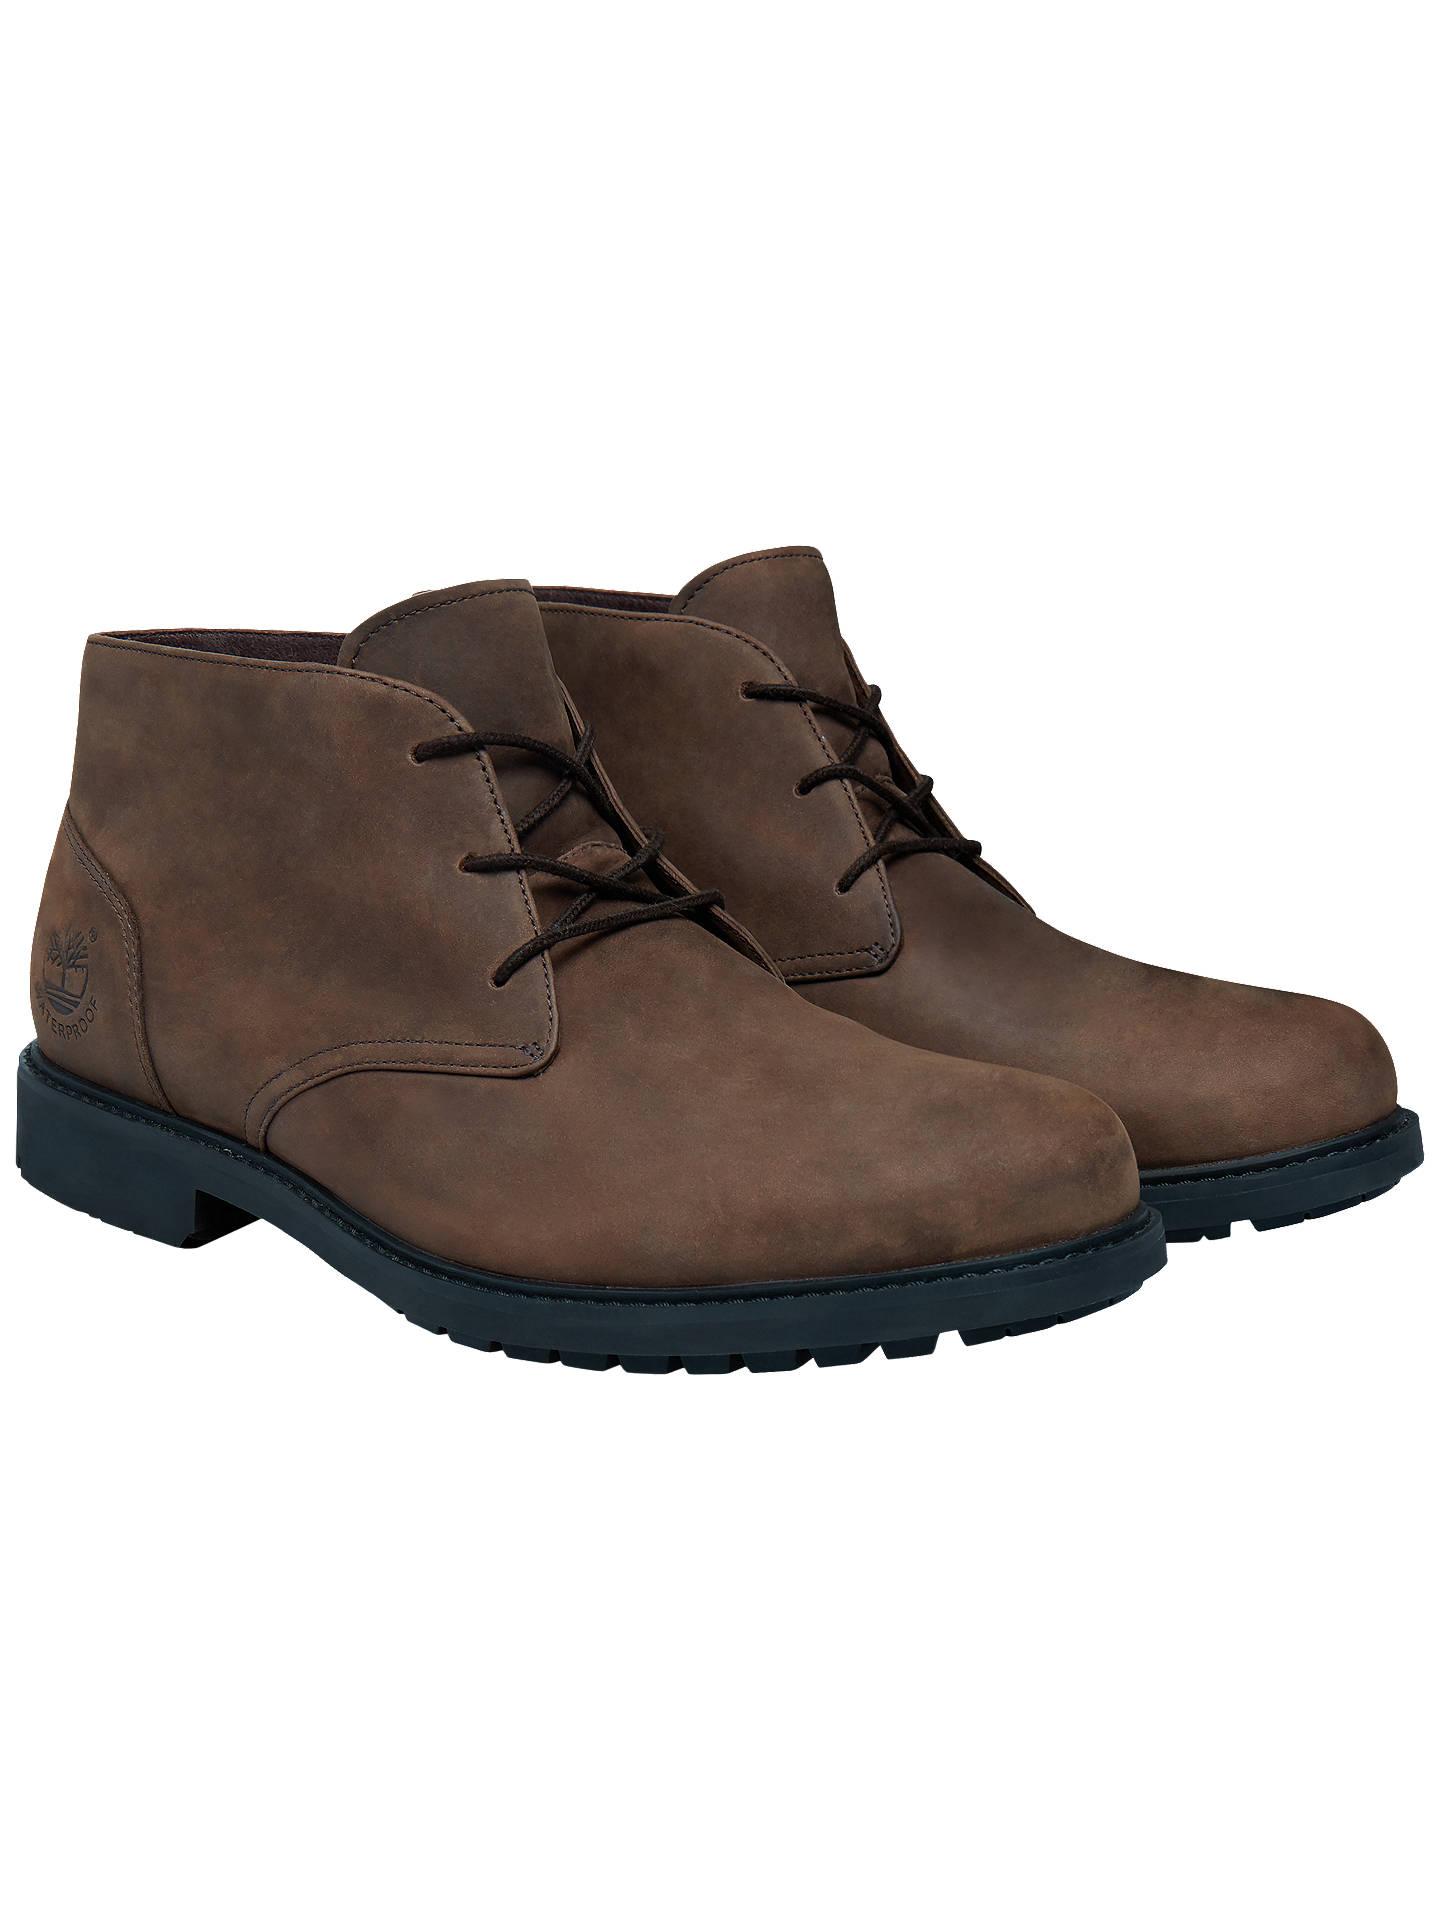 Timberland Stormbuck Waterproof Chukka Boots Dark Brown At John